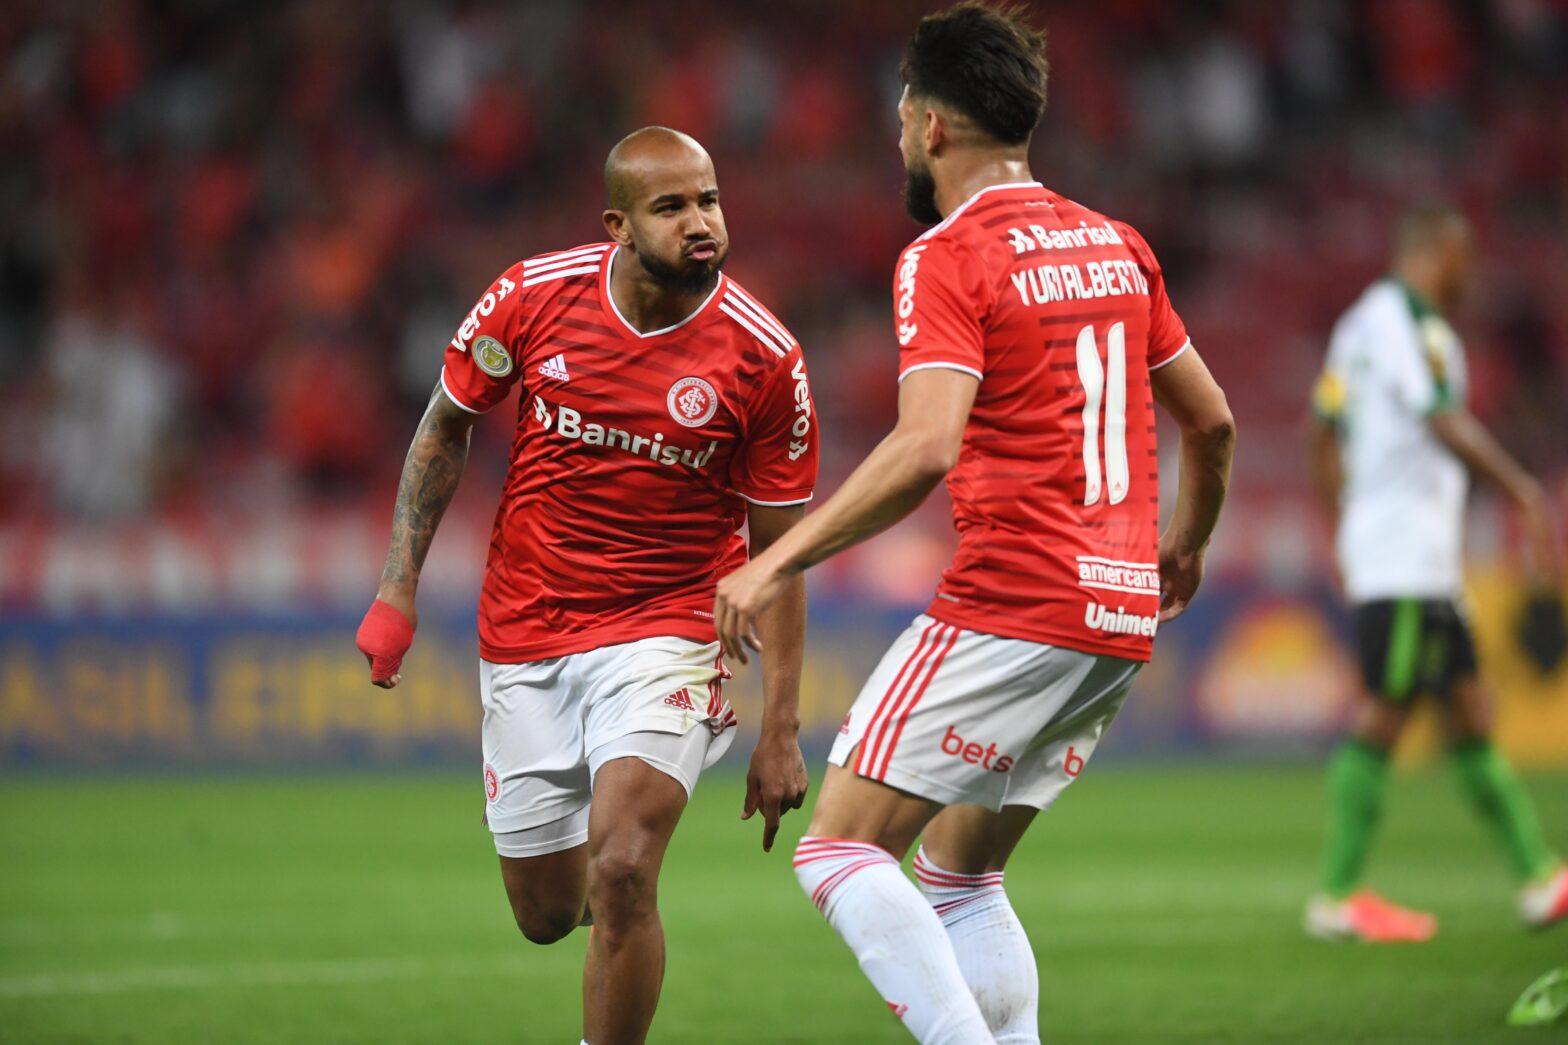 Beira-Rio vira Wakanda, e Inter vence o América-MG por 3 a 1